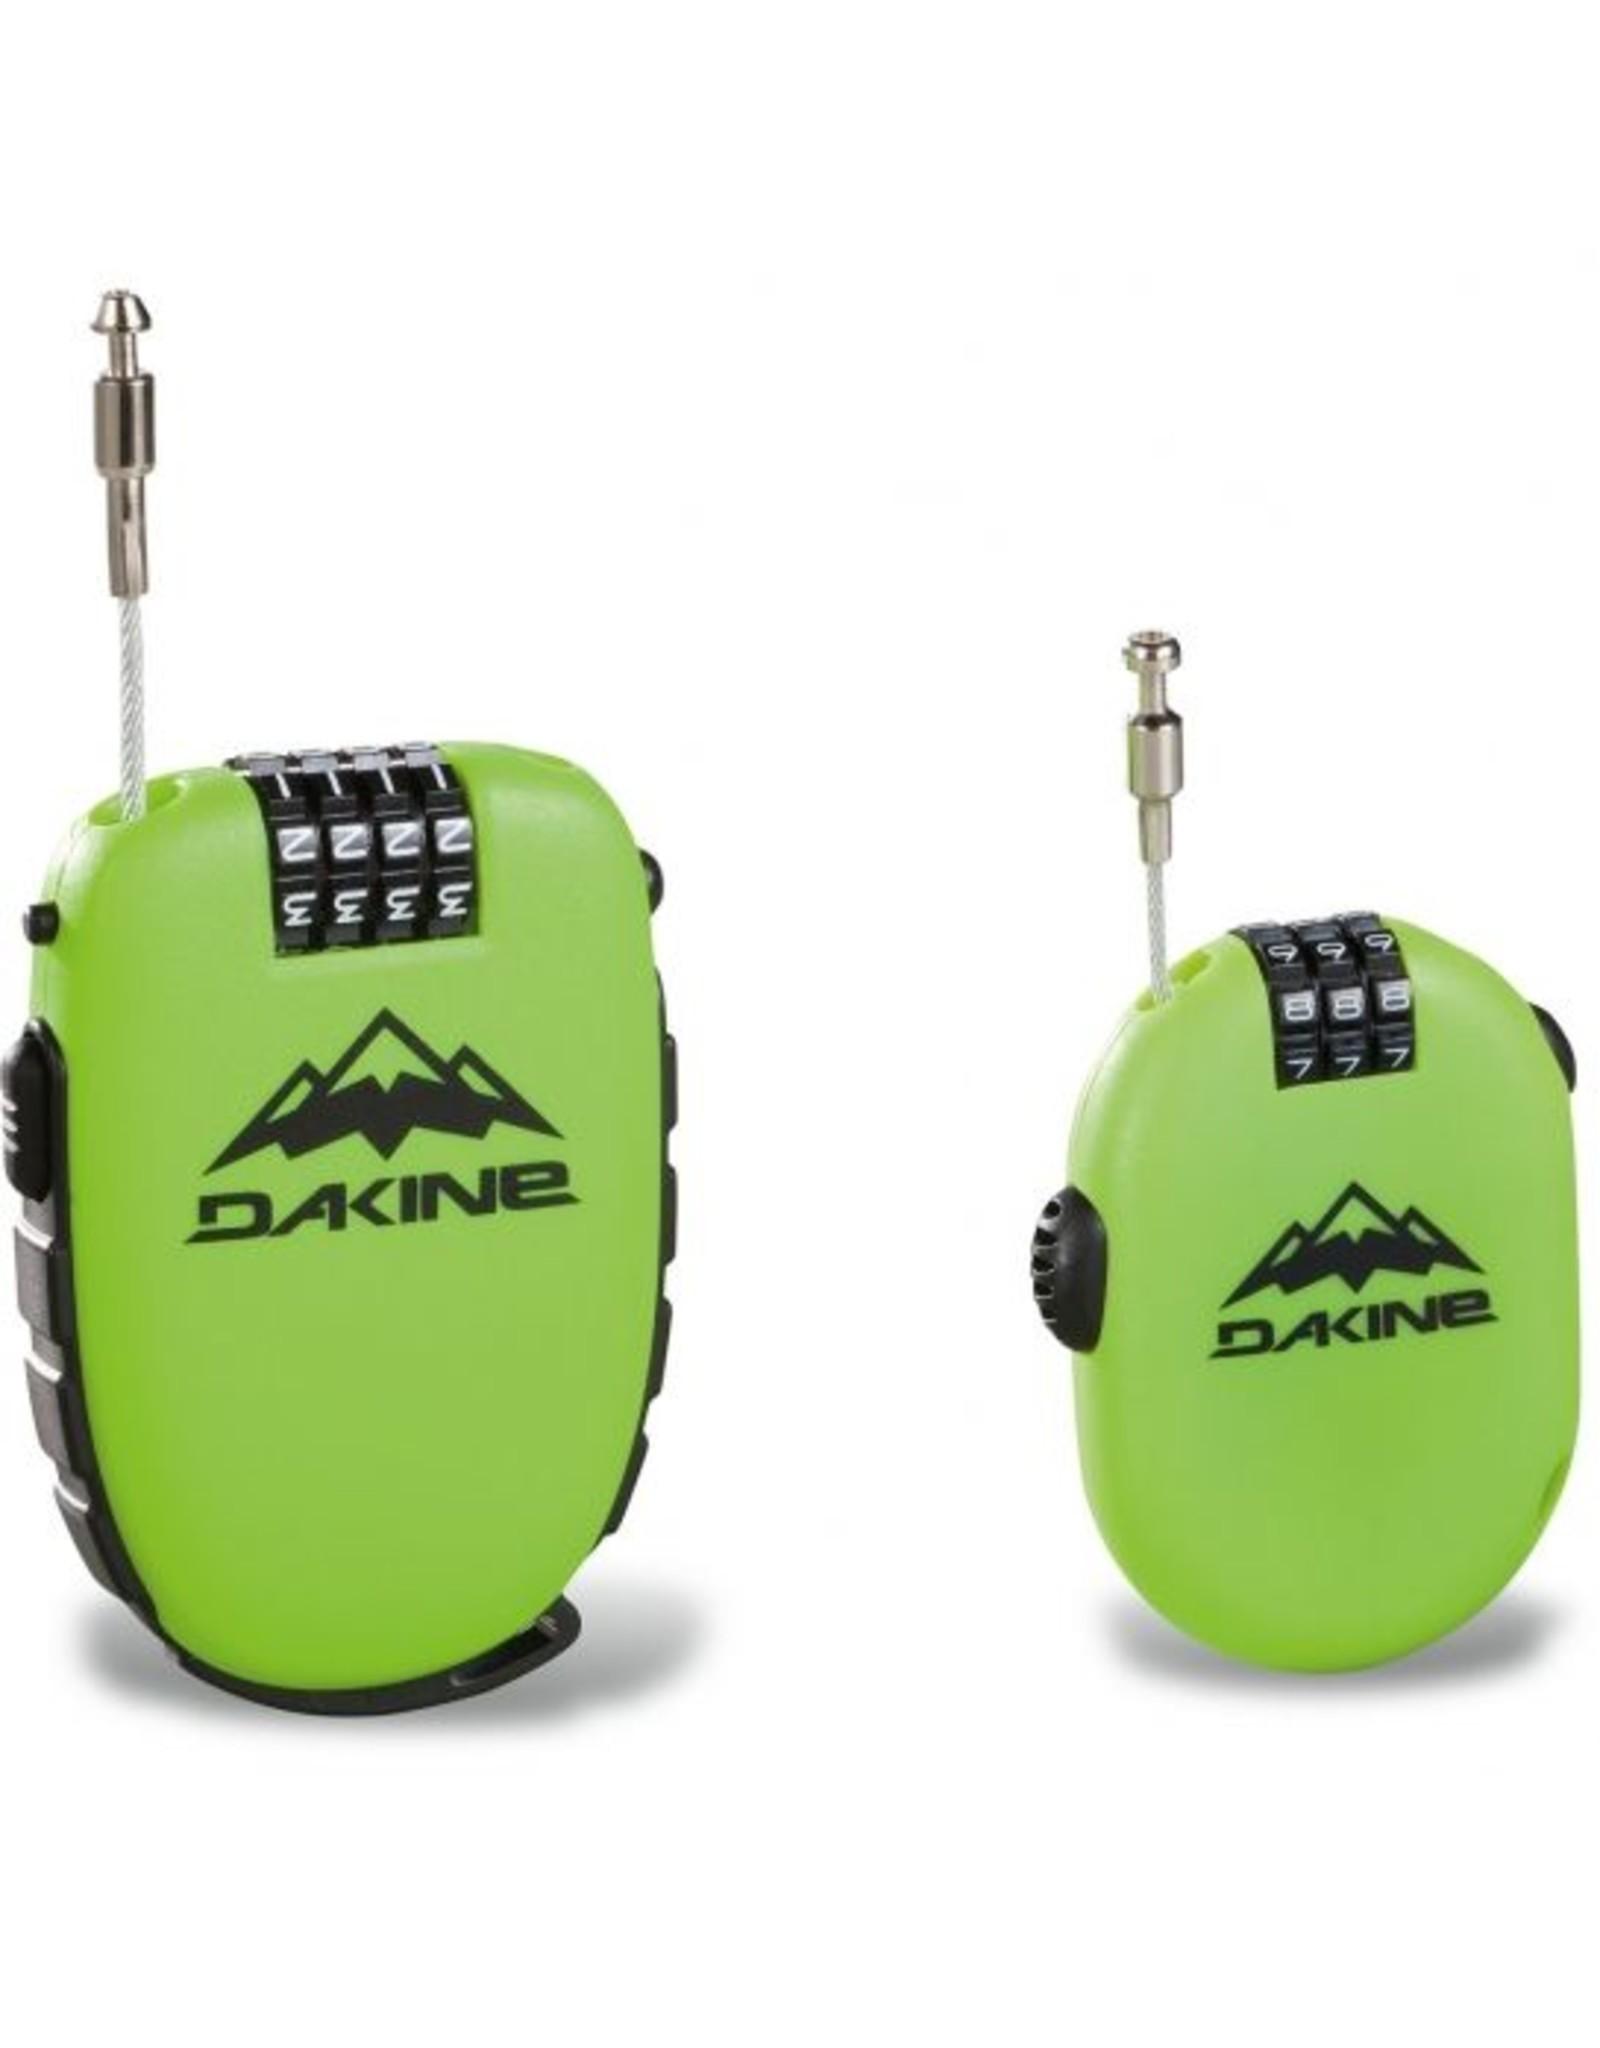 Dakine Dakine Cool Lock Cable Lock